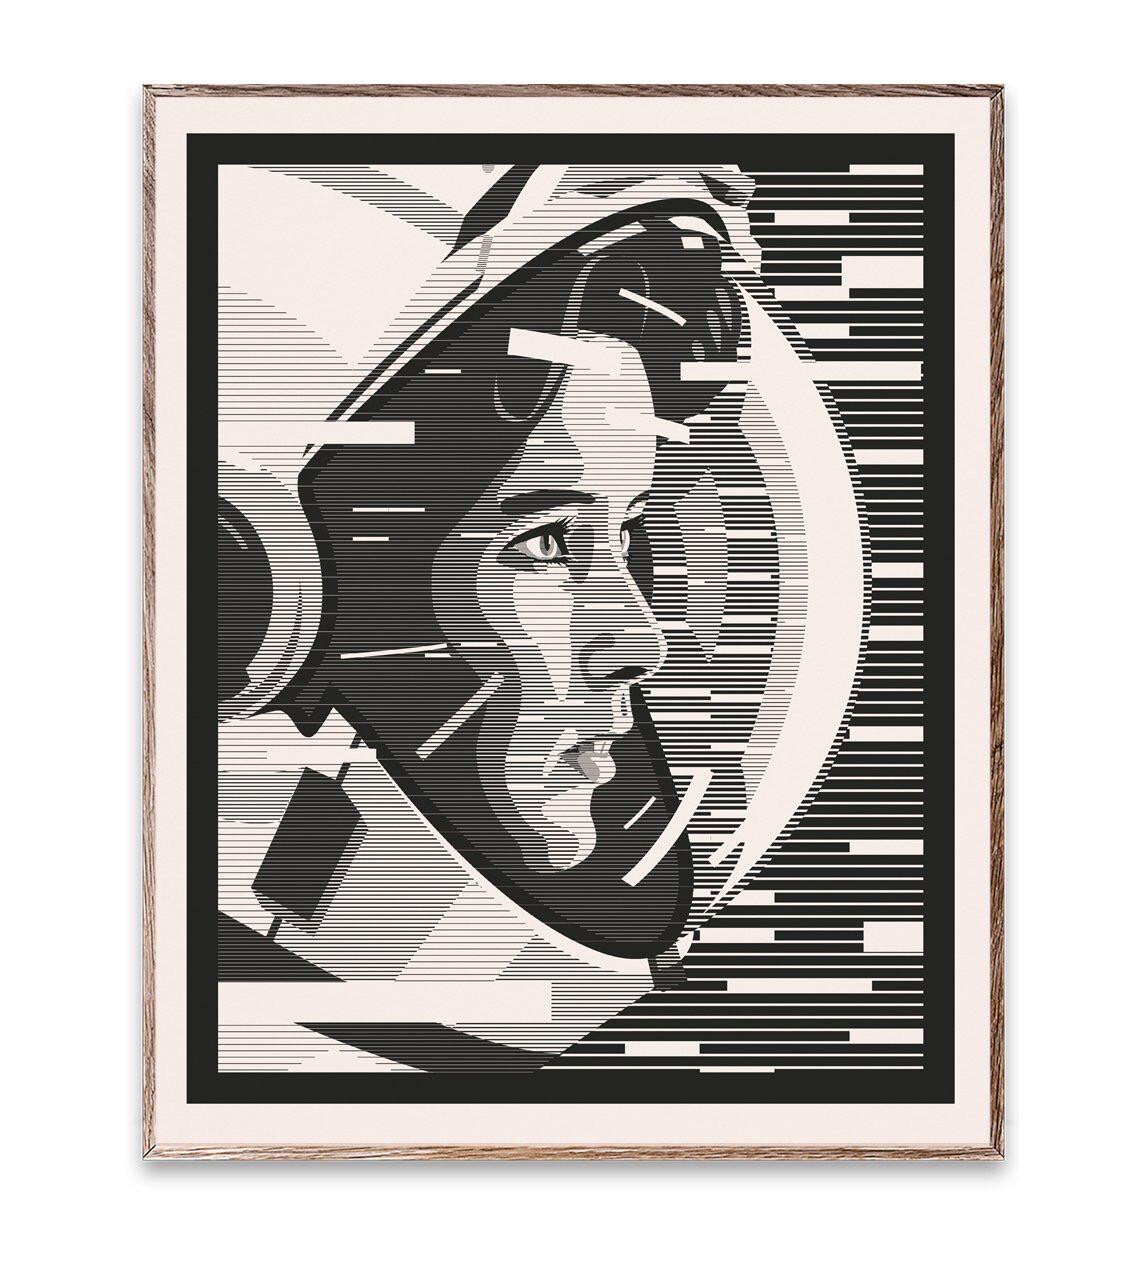 Astronat By Børge 300g Beige Paper